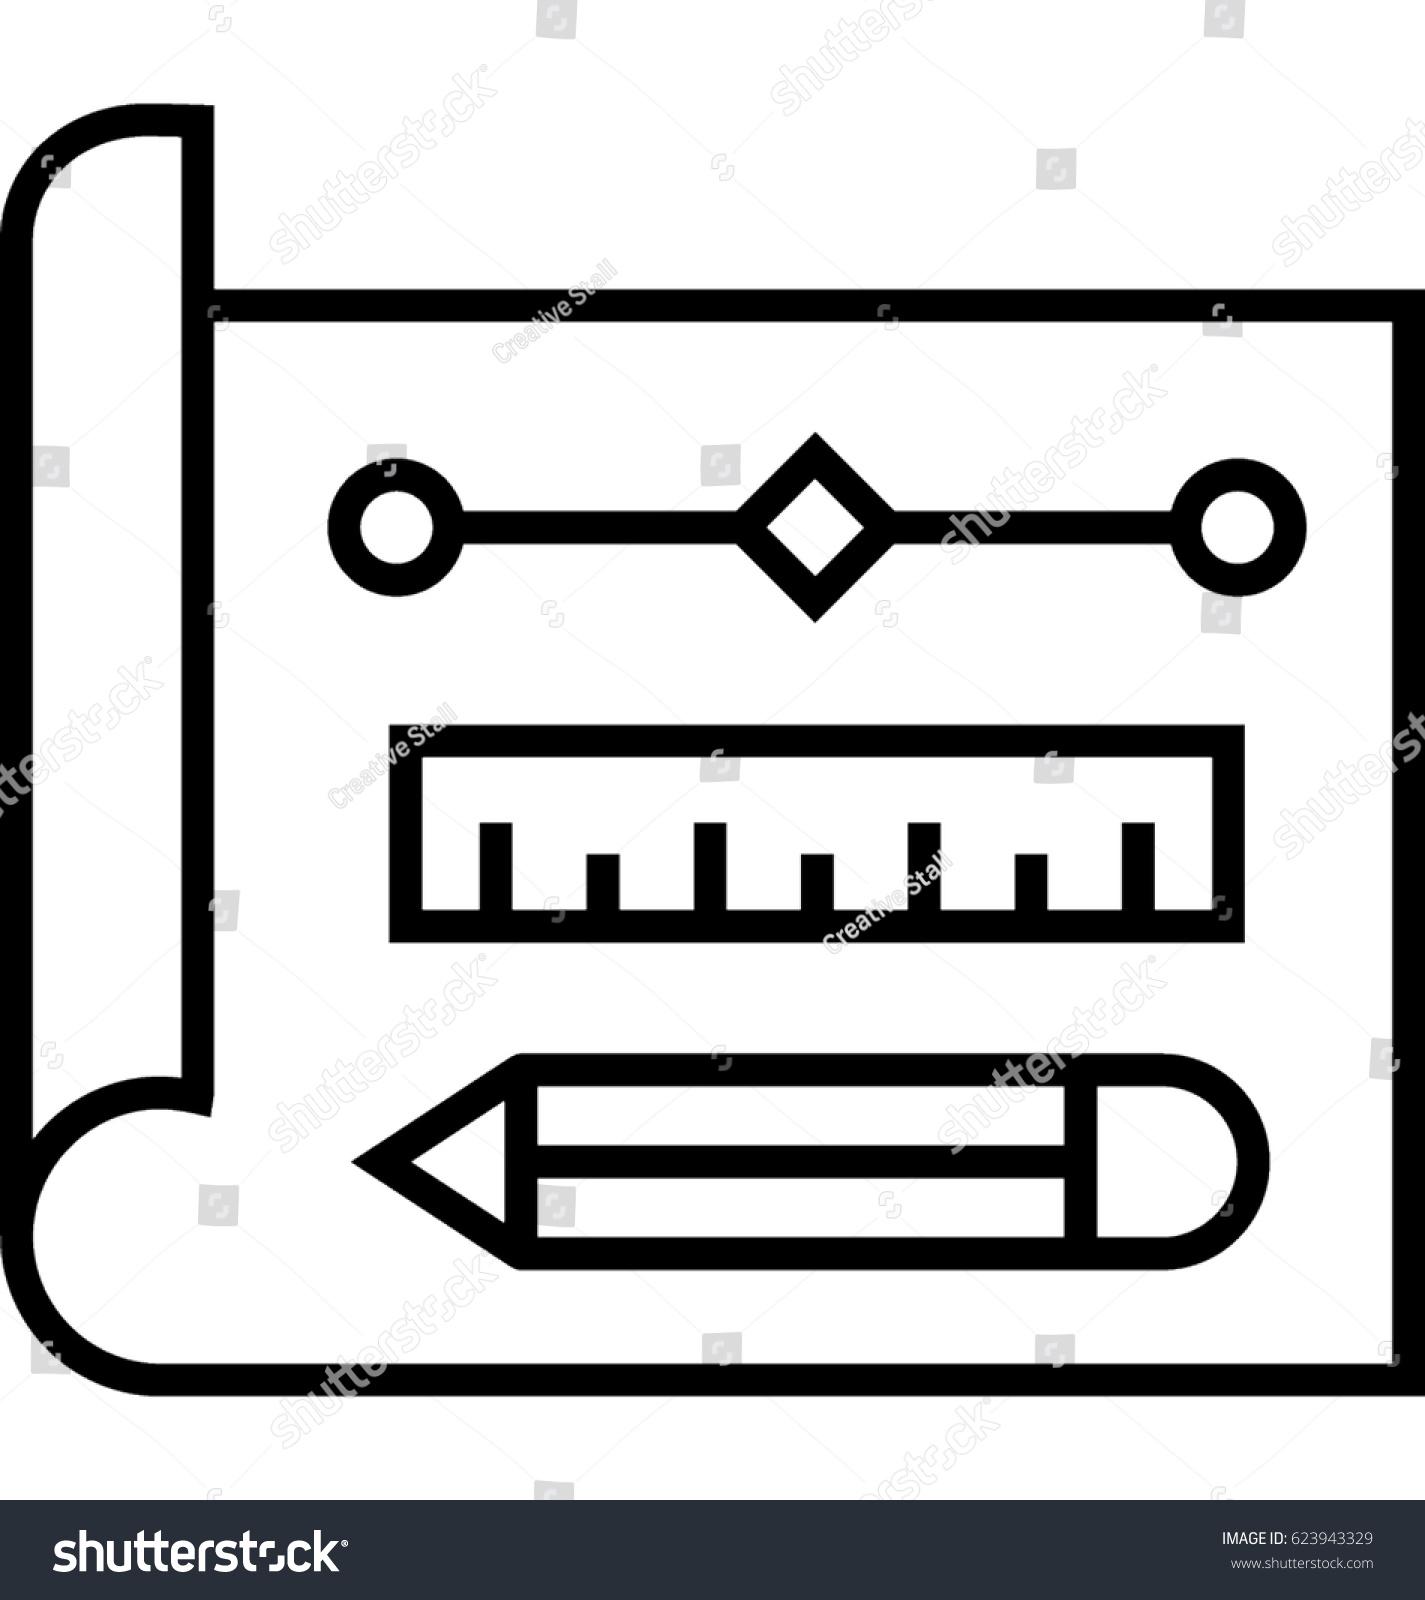 Prototype Vector Icon Stock Vector 623943329 - Shutterstock  Prototype Vecto...